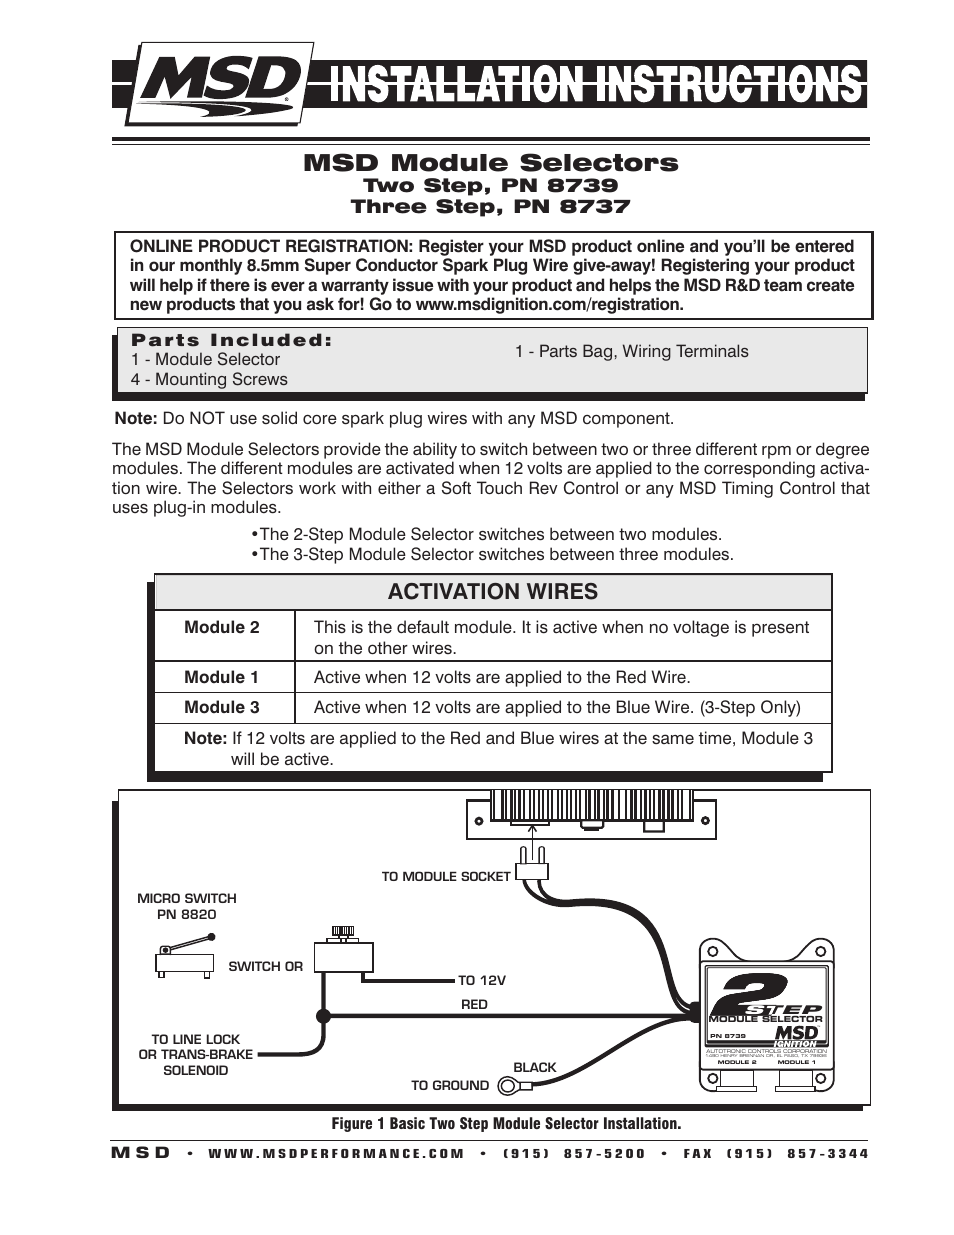 Outstanding Msd Wiring Diagrams Photos - Diagram symbol - pasutri.us